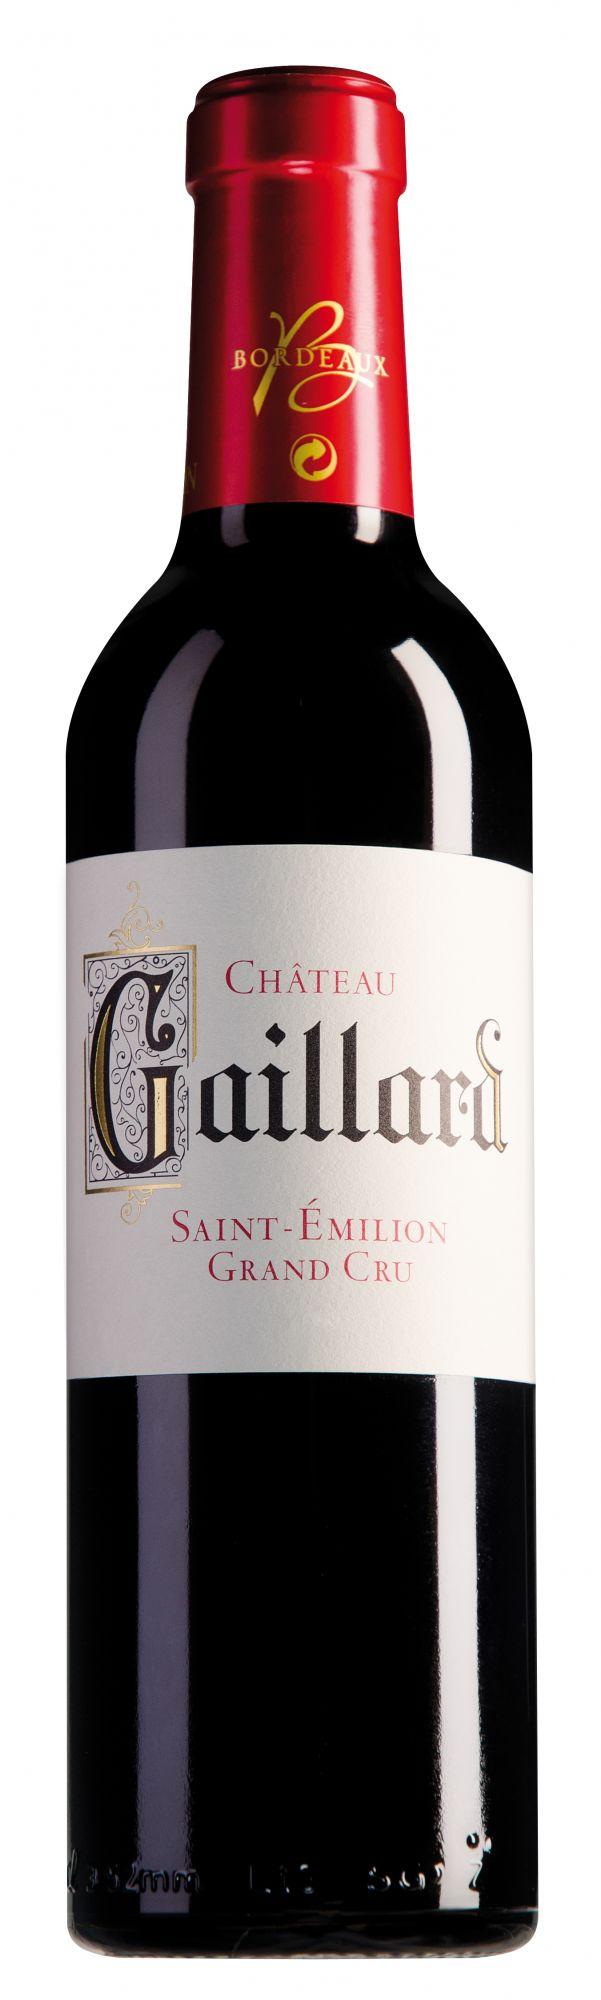 Château Gaillard Saint-Émilion Grand Cru halve fles